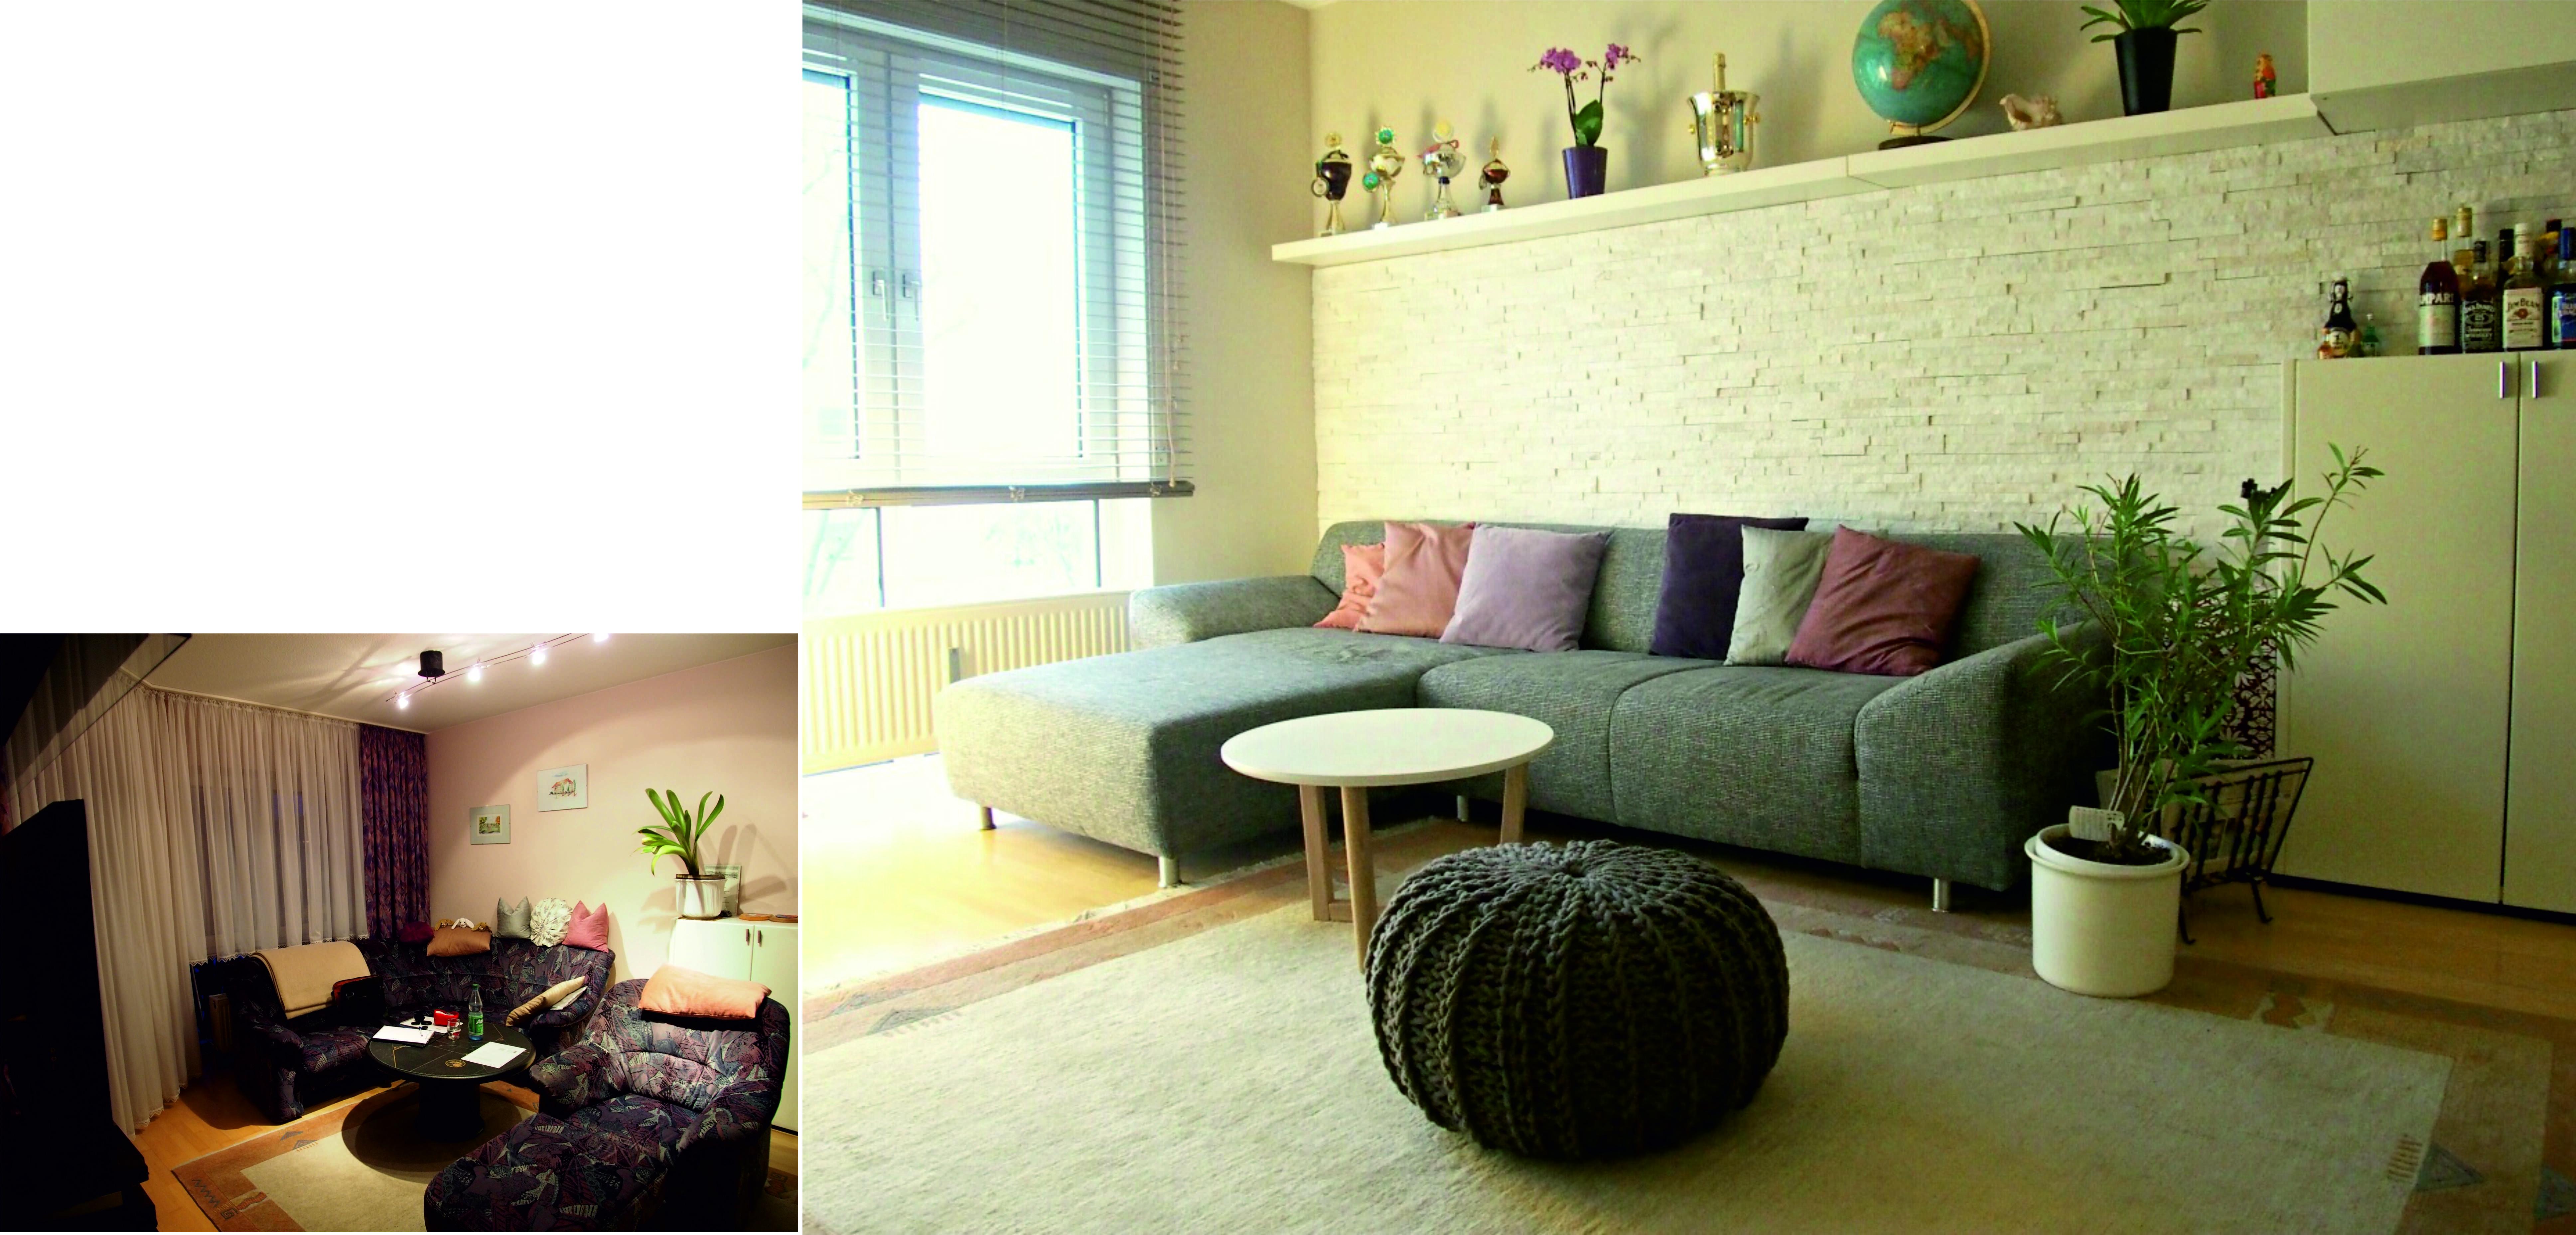 10+ wohnzimmer einrichtungsideen - Beste Ideen 10  Living room